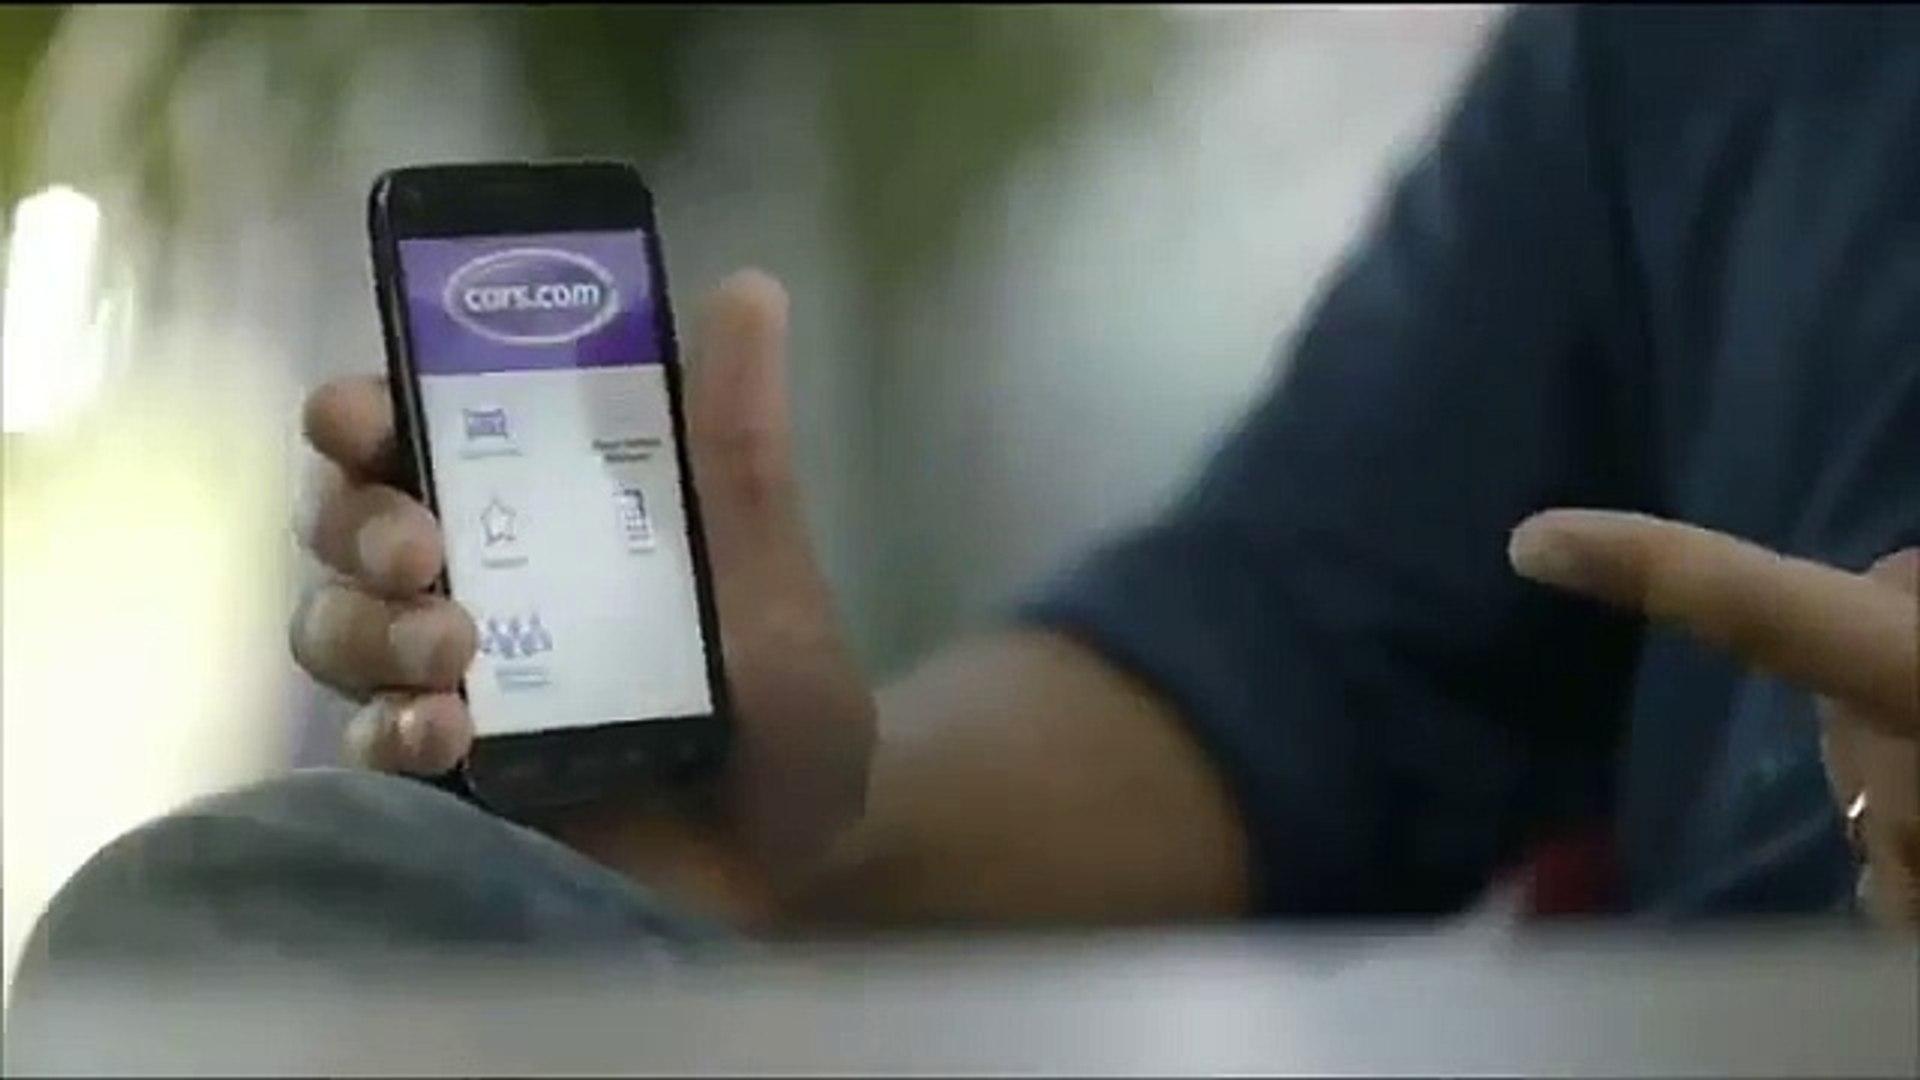 Football   Cars.com TV Commercial, Featuring James Van Der Beek